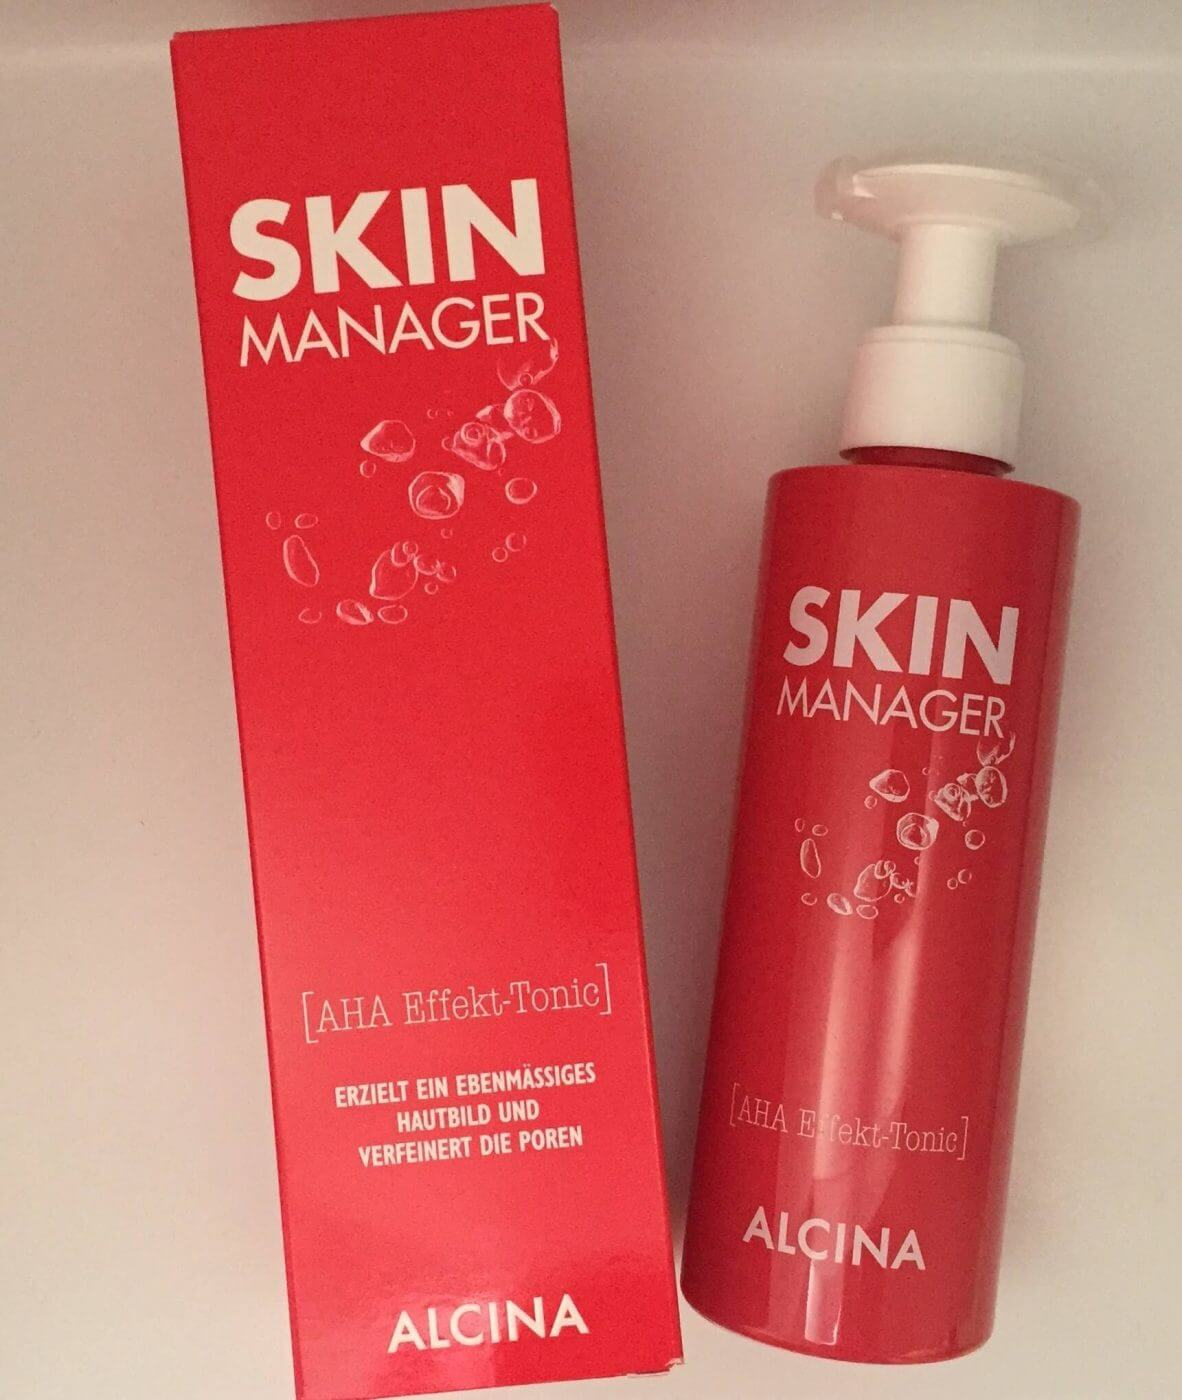 Alcina Skin Manager Originalflasche